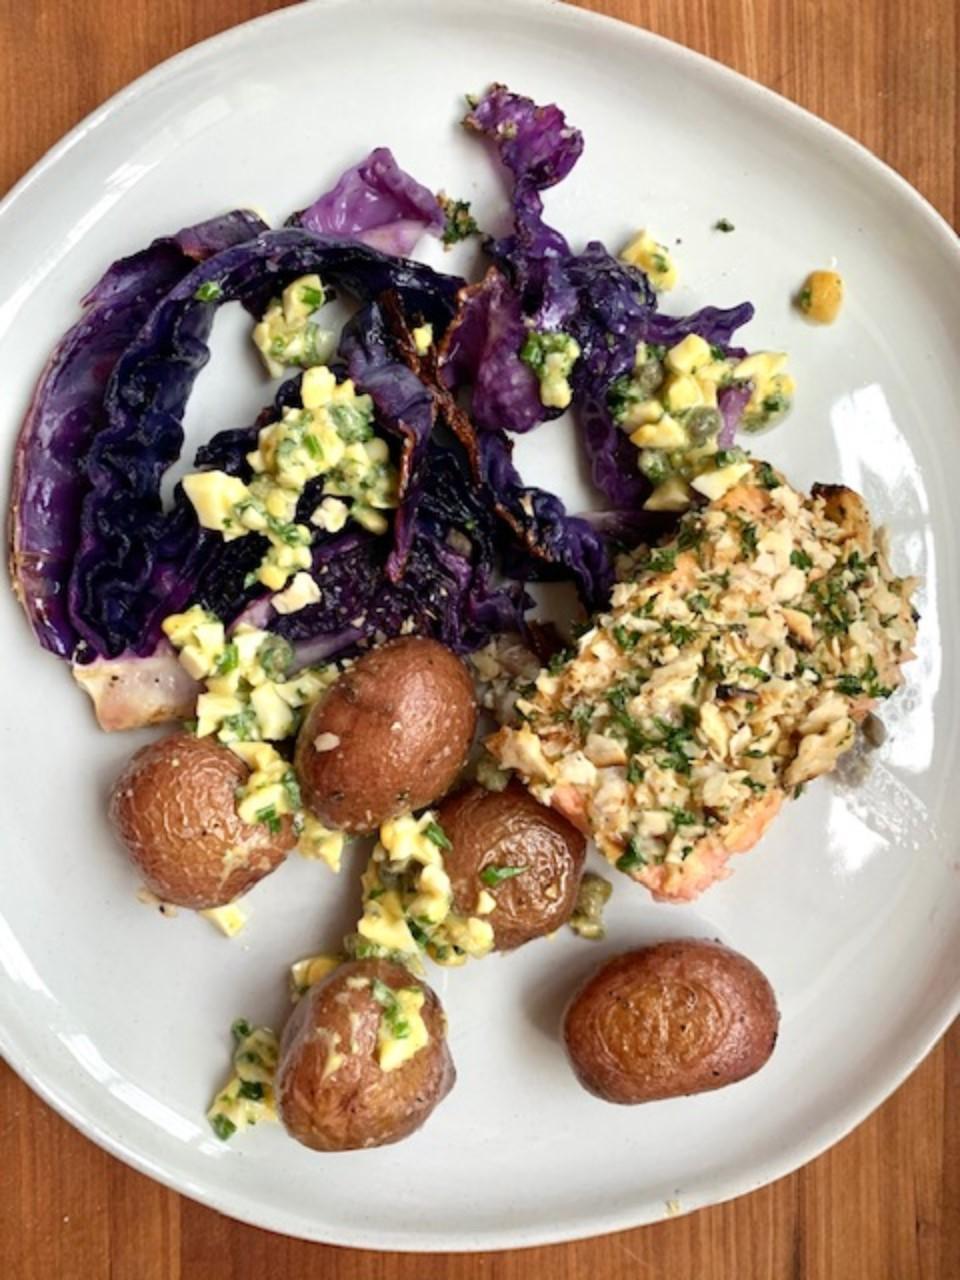 Sheet Pan Passover Dinner AllrecipesPhoto